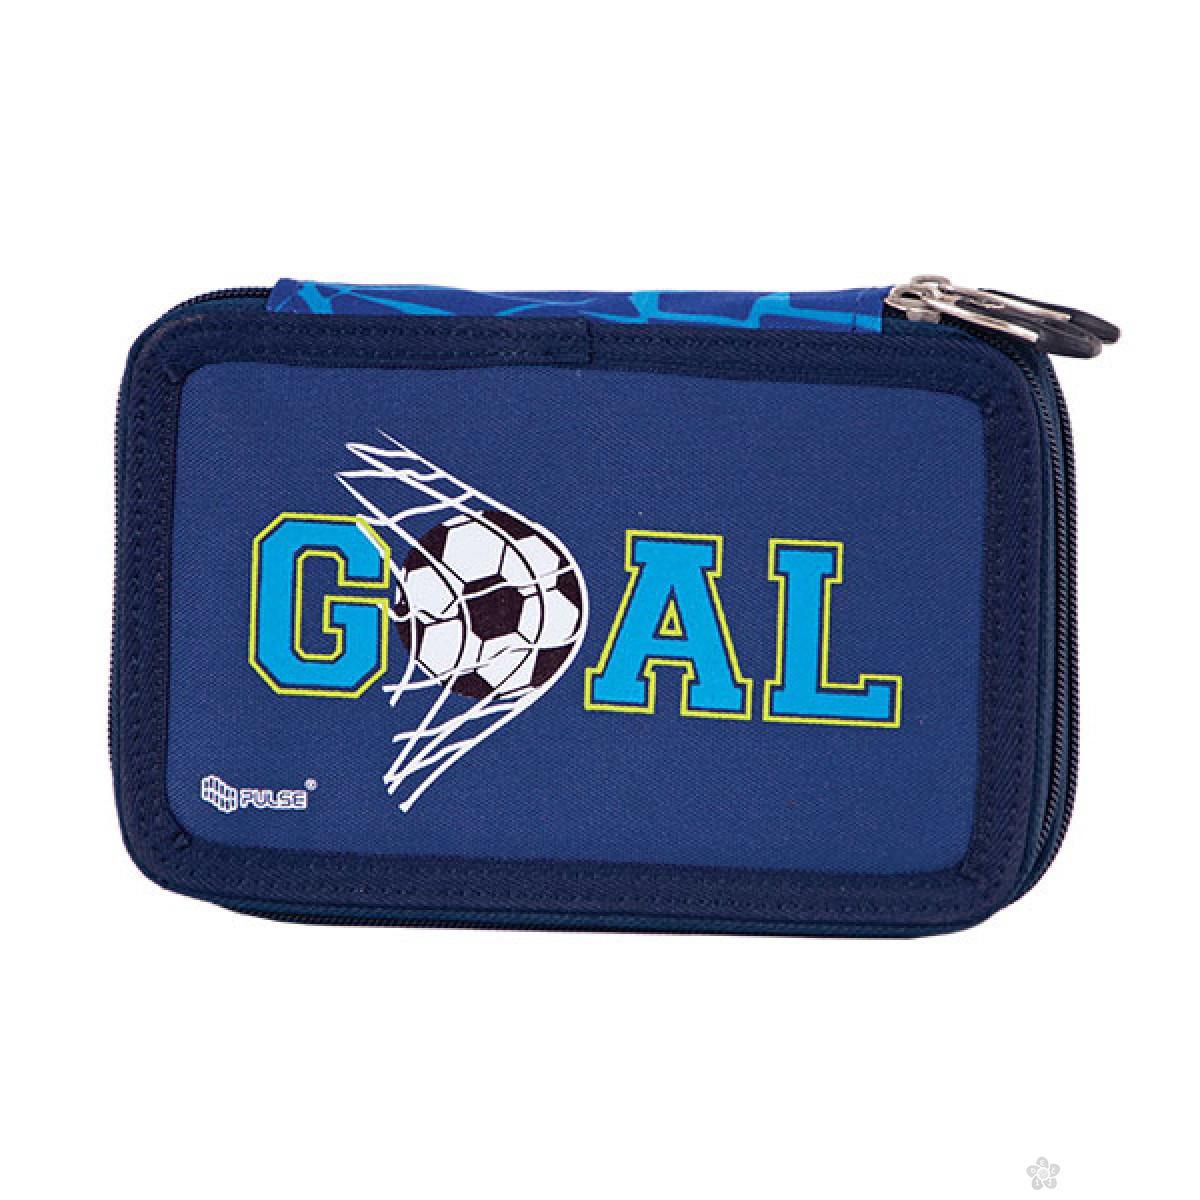 Dvodelna pernica Anatomic Blue Goal